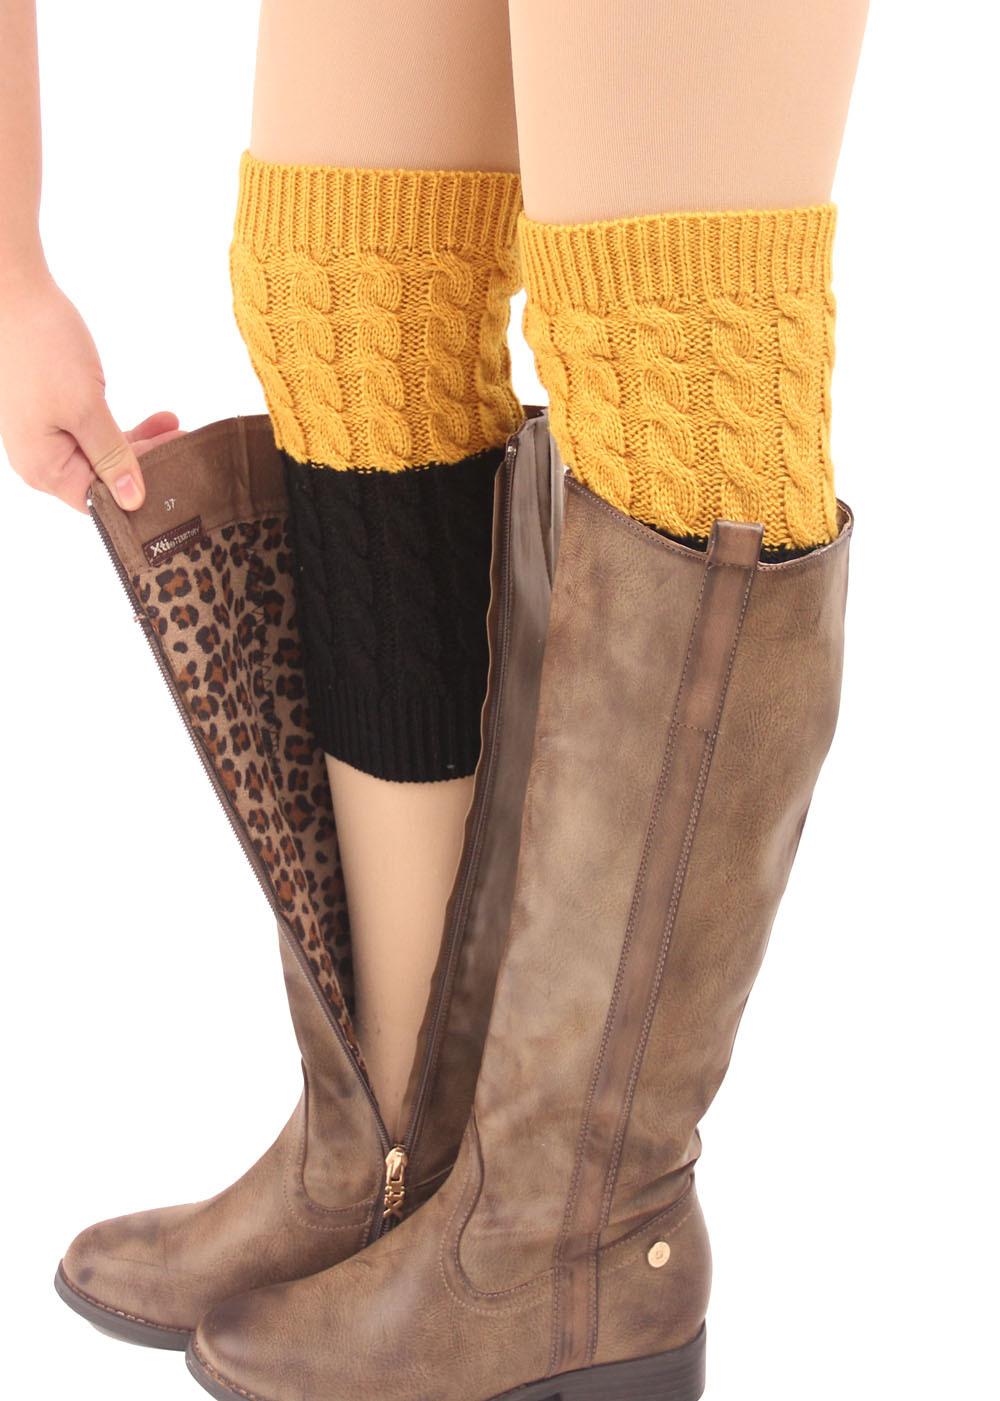 Women's Boot Socks Cuffs Crochet Knitted Stocking Leg Warmers Button Boot Knee Socks Botas De Mujer Boot Socks